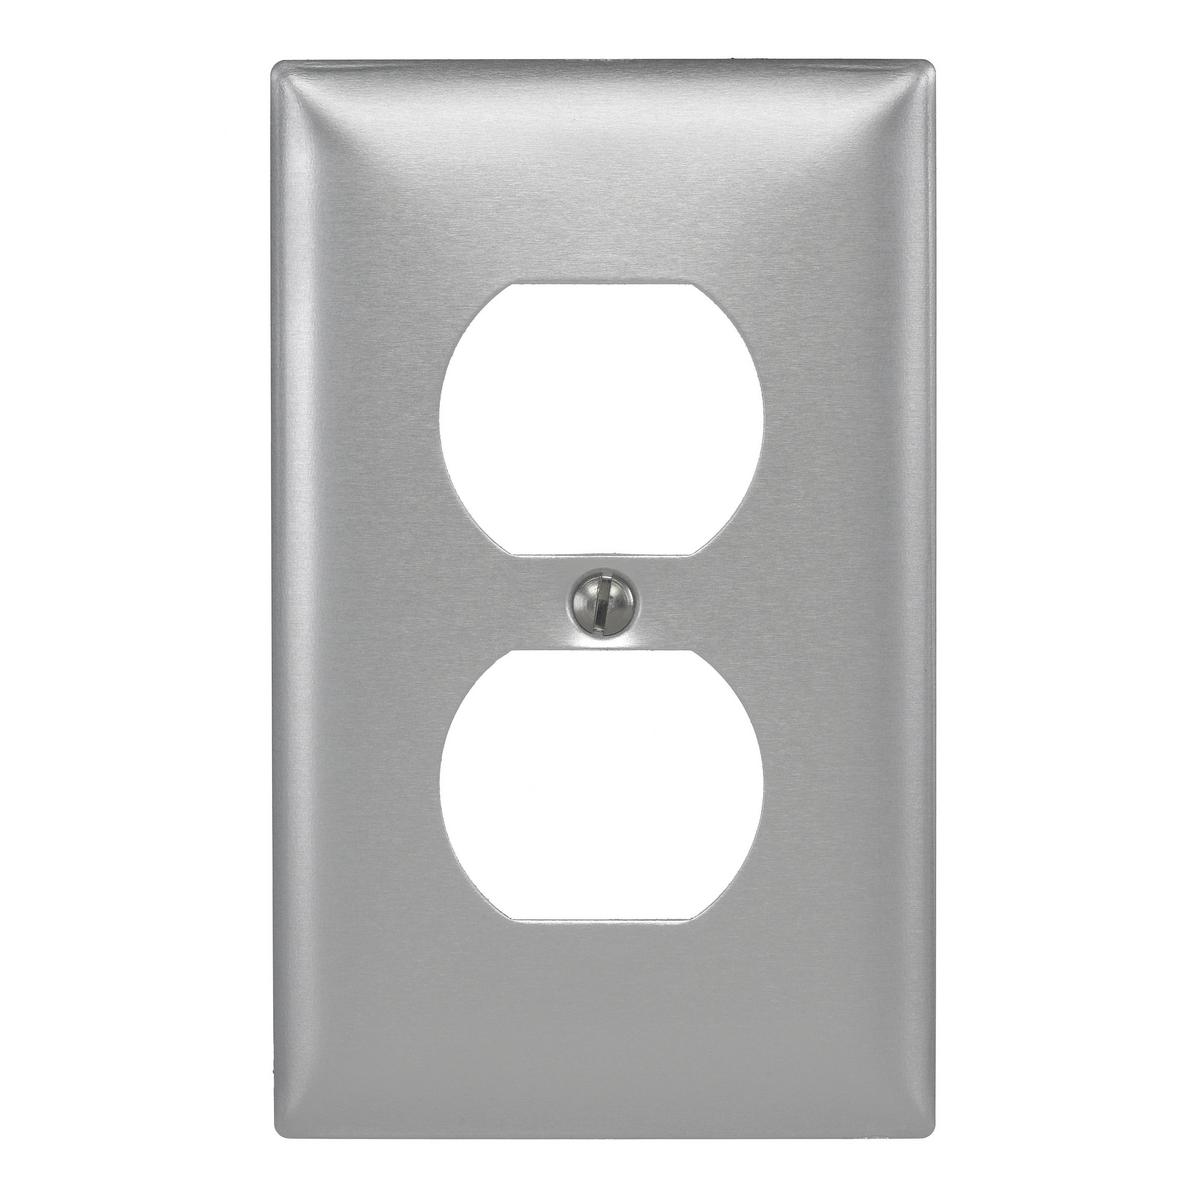 Hubbell SA8 1-Gang Aluminum 1-Duplex Receptacle Strap Mount Wallplate